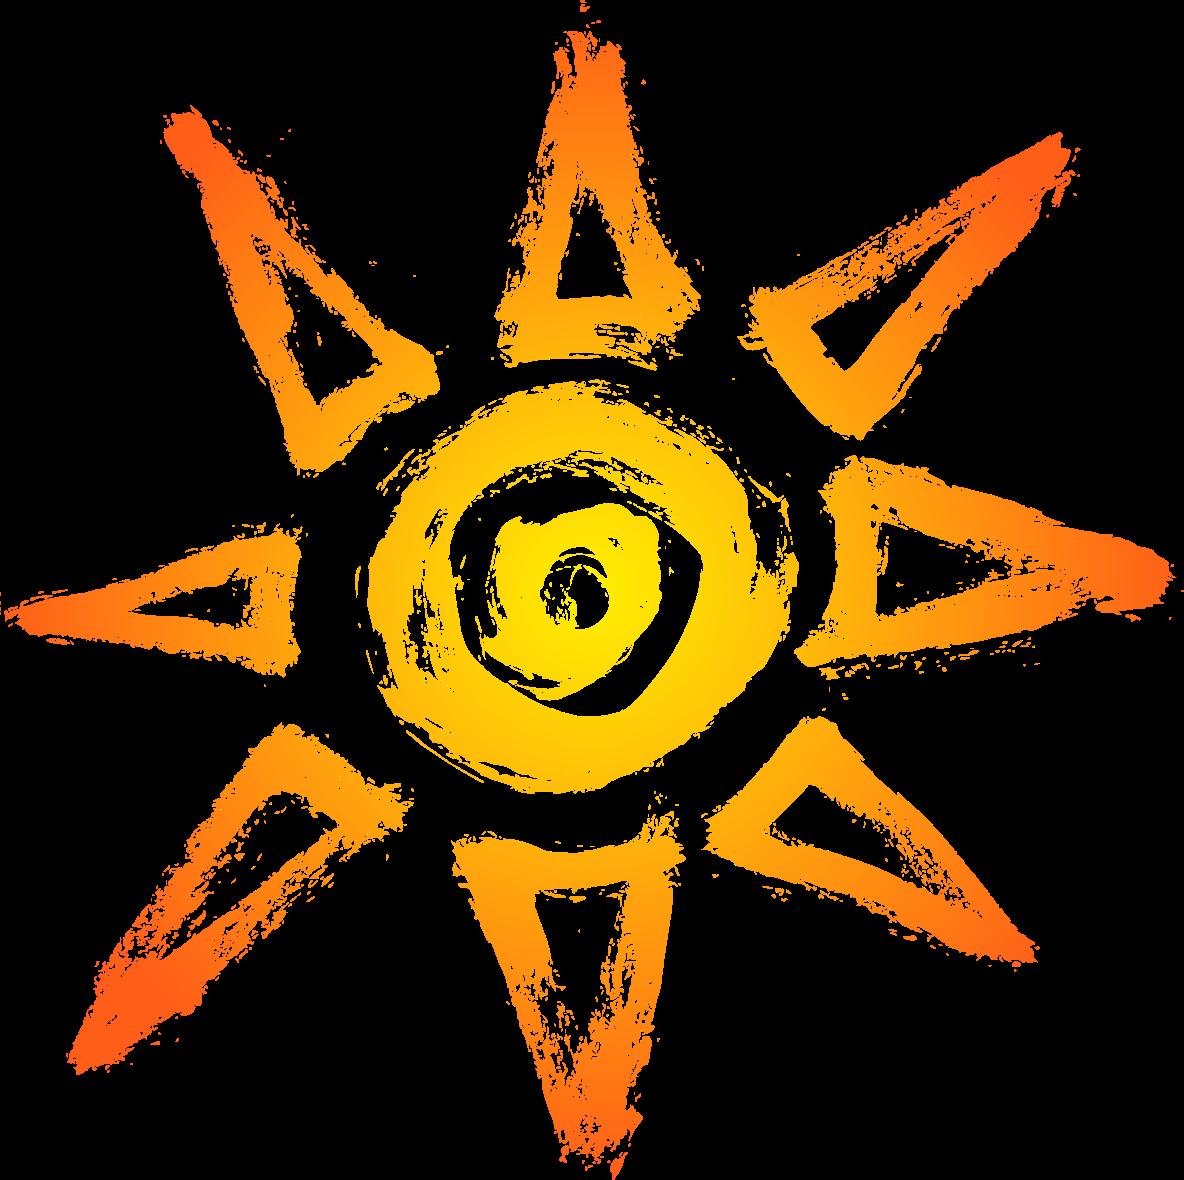 grunge-sun-5.png